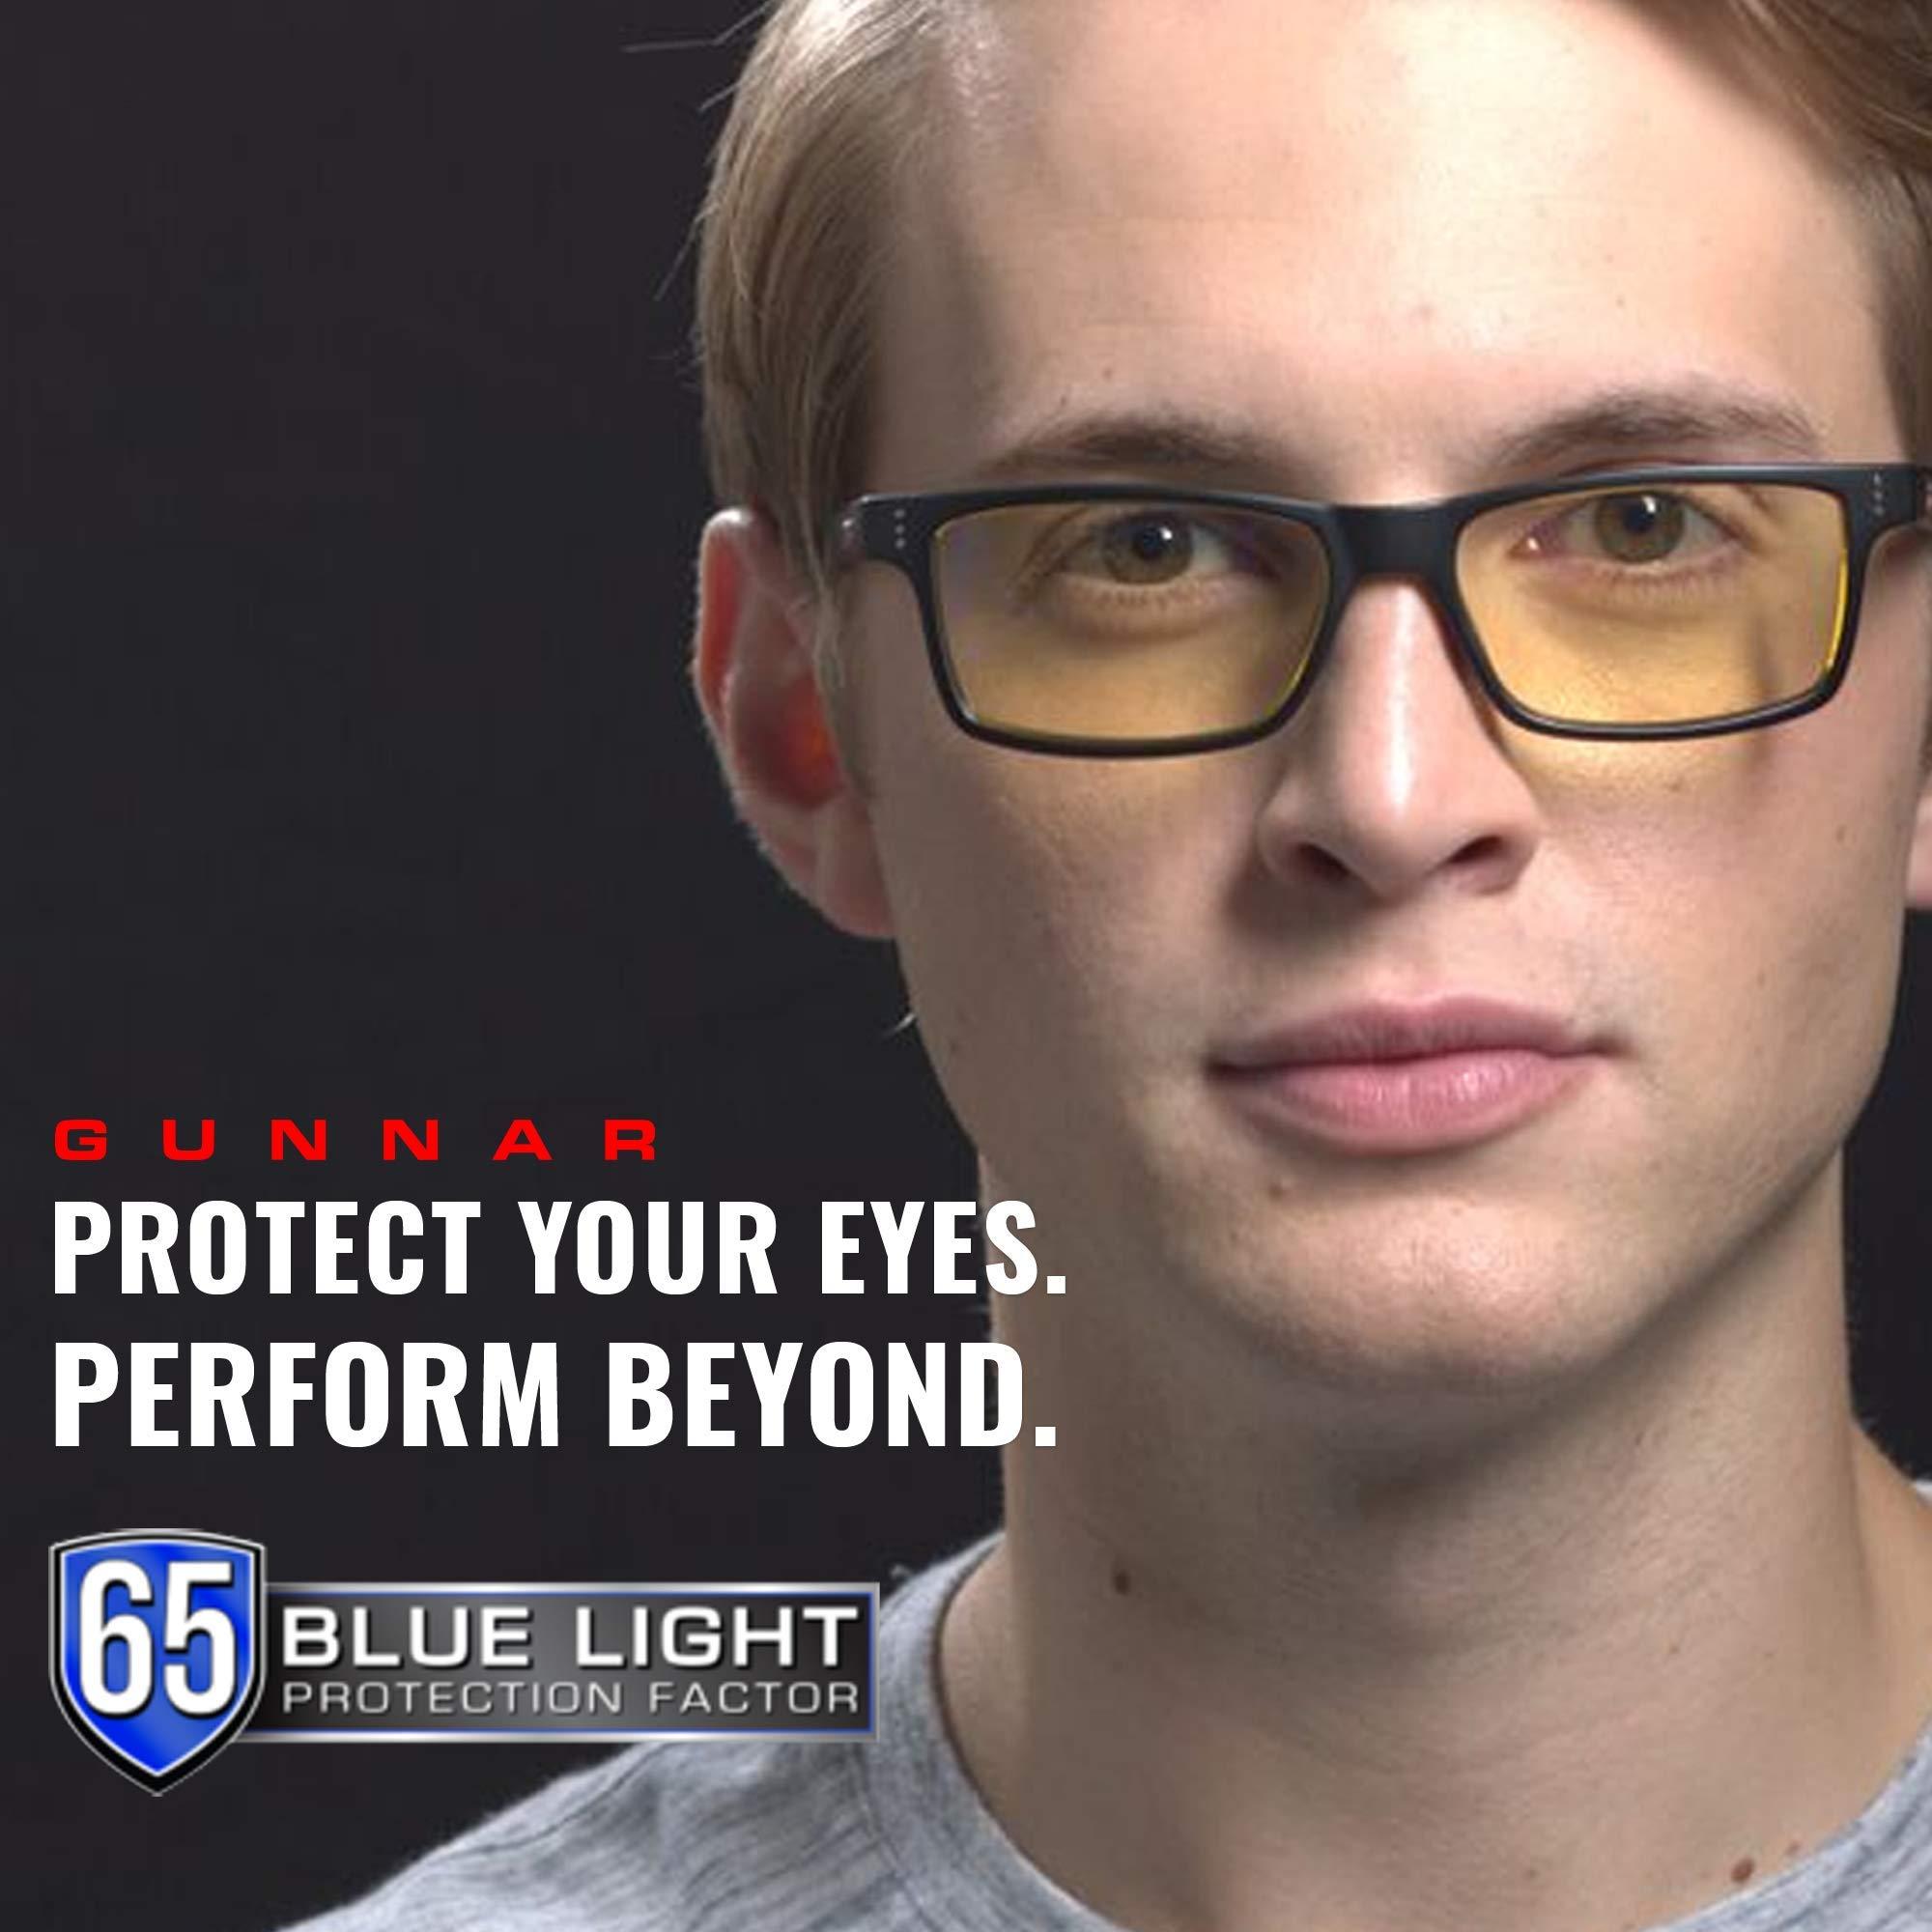 GUNNAR Gaming and Computer Eyewear /Intercept, Amber Tint - Patented Lens, Reduce Digital Eye Strain, Block 65% of Harmful Blue Light by Gunnar Optiks (Image #6)